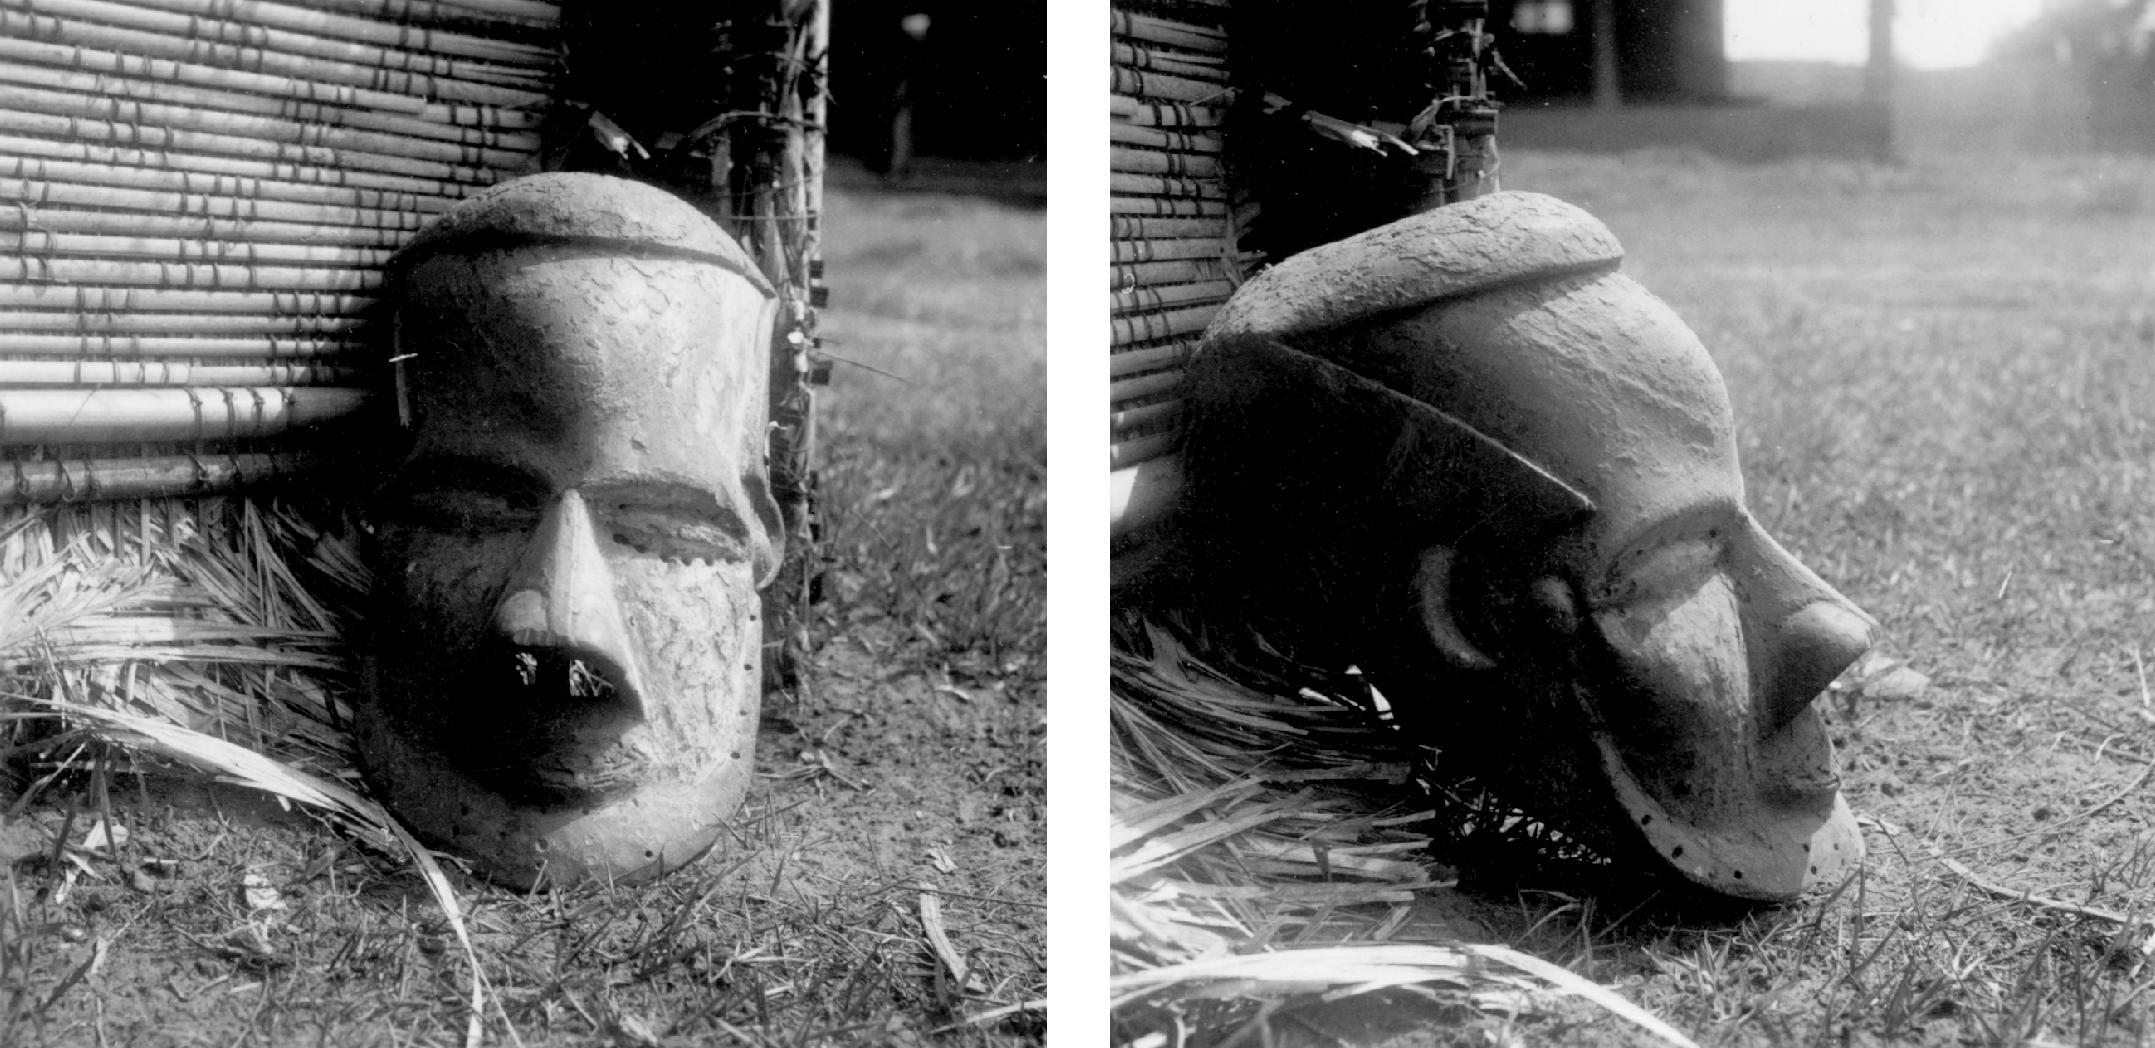 Kuba-Bushong Bwom Mask in Royal Collection